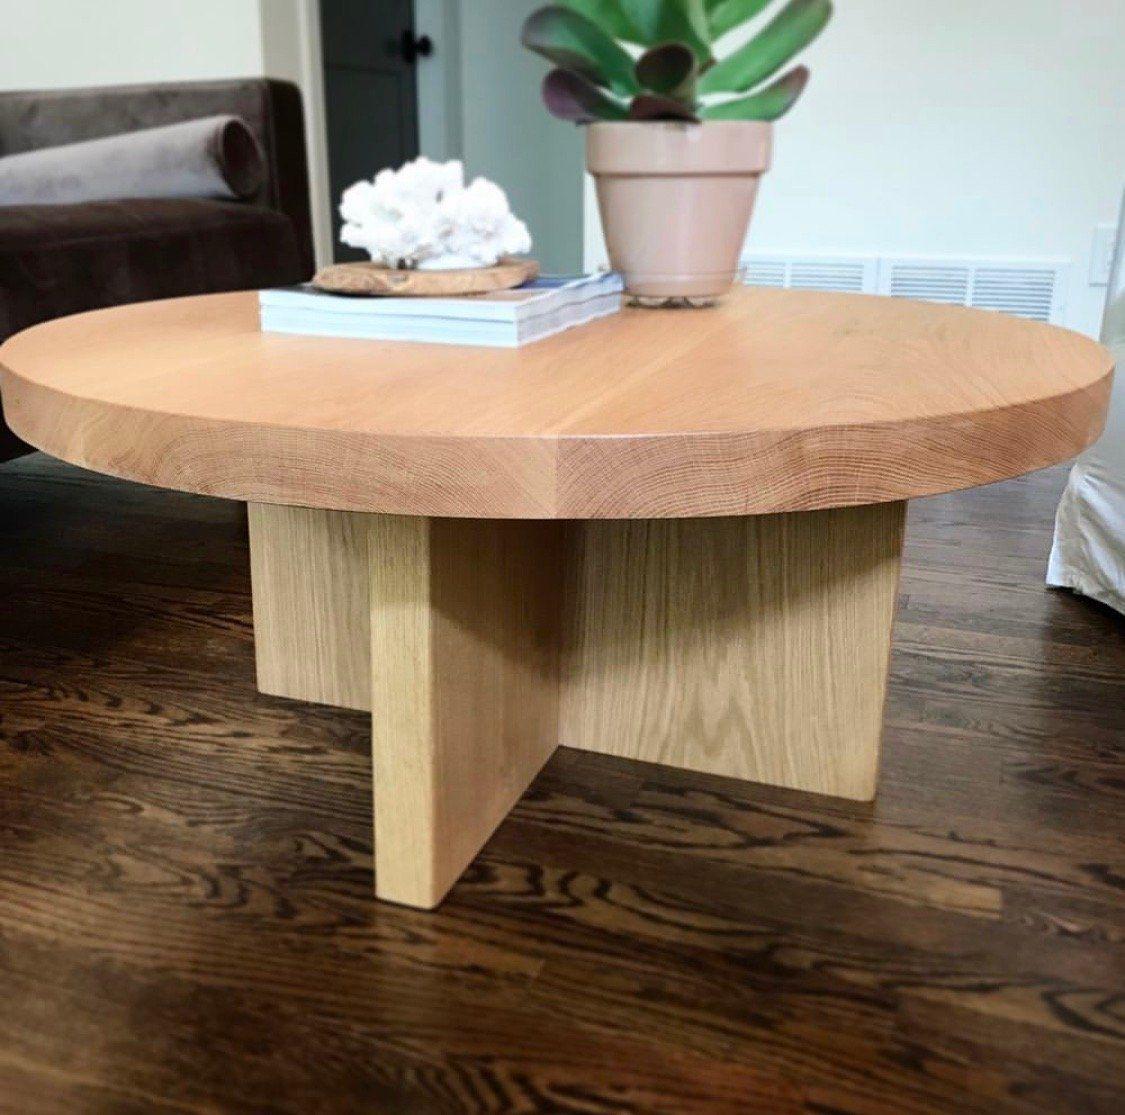 30 Inch Round Coffee Table In 2020 White Oak Coffee Table Oak